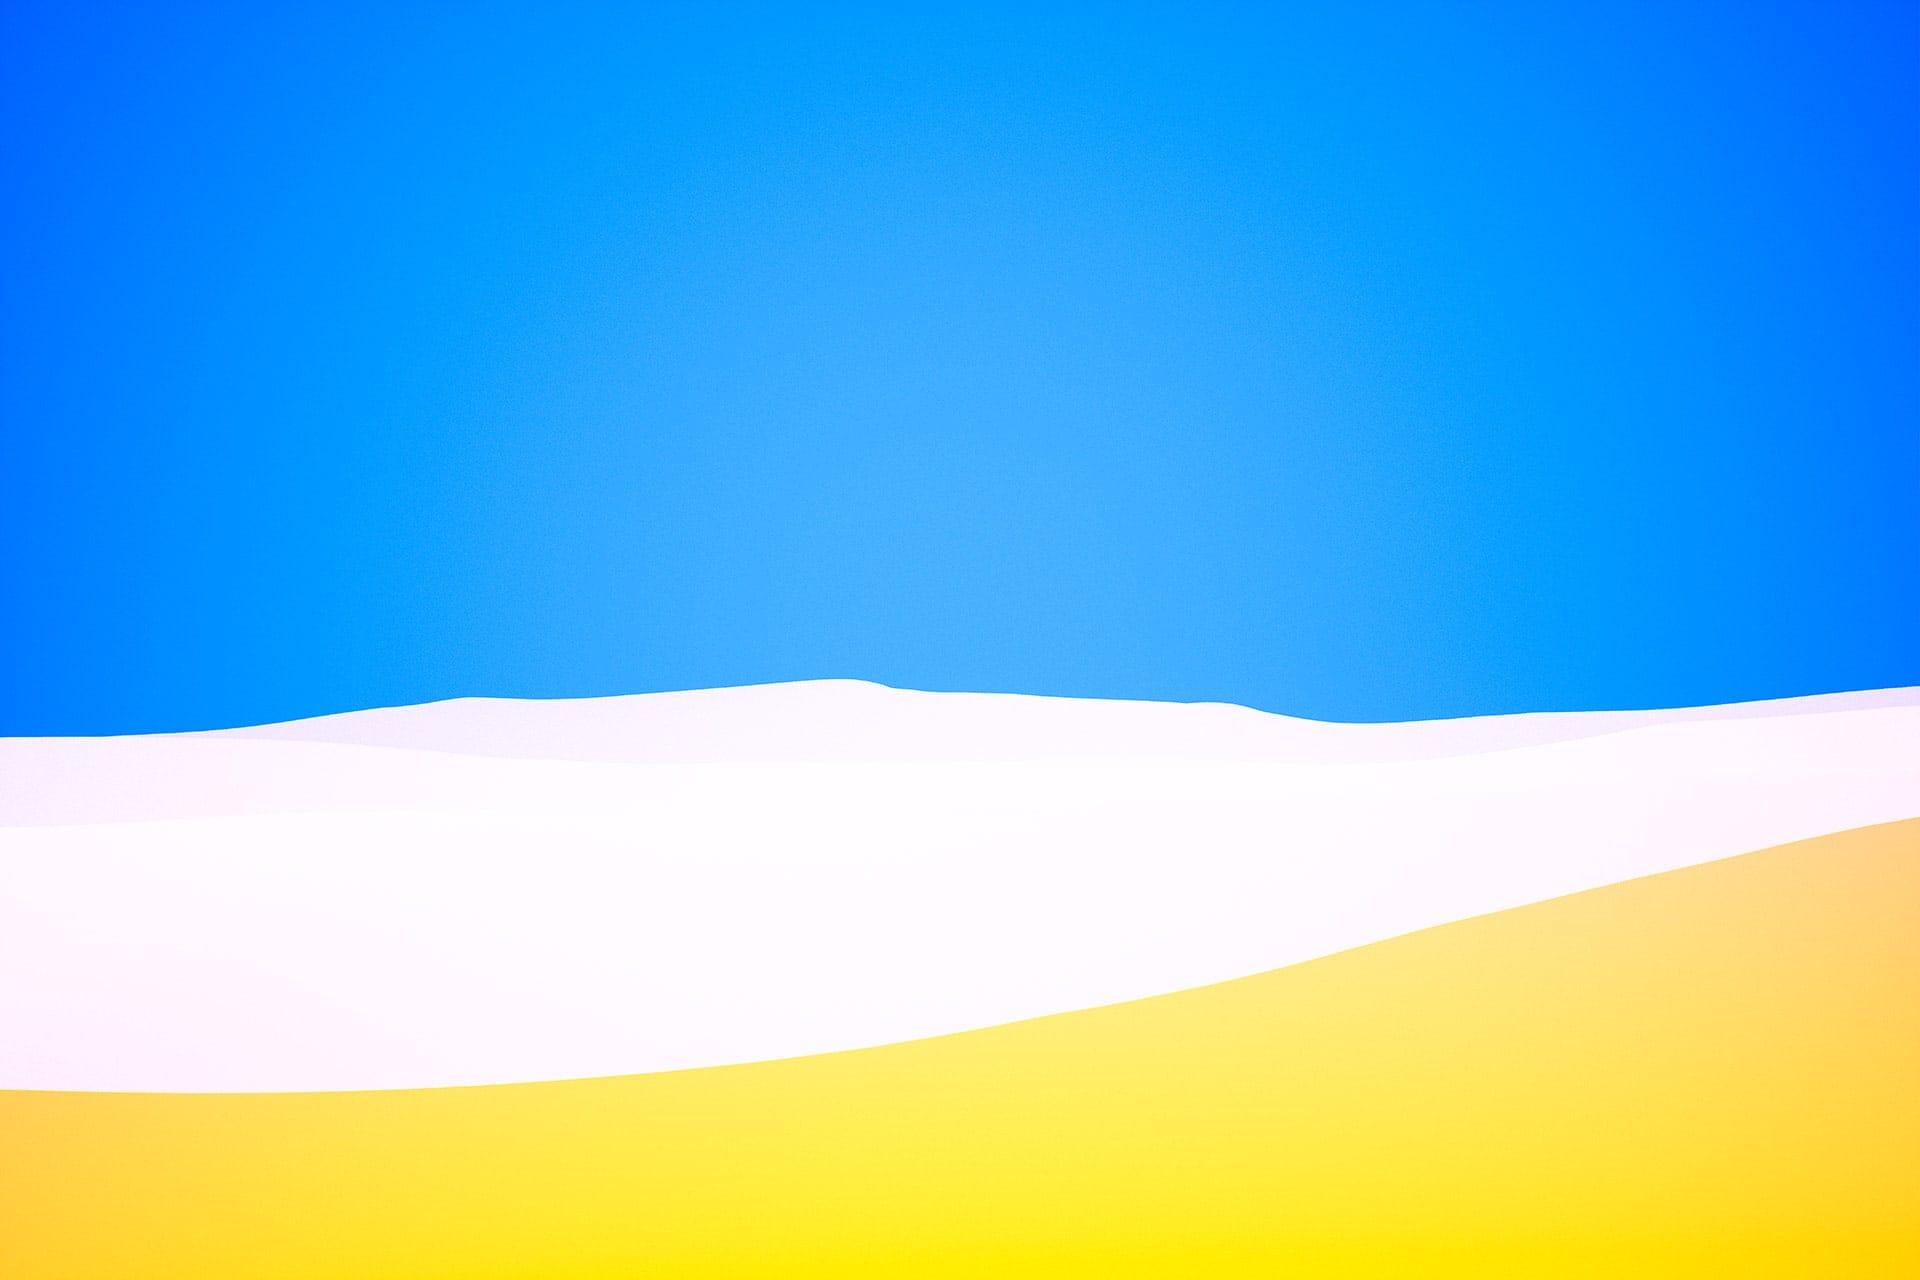 artnorama - Strata of Desert